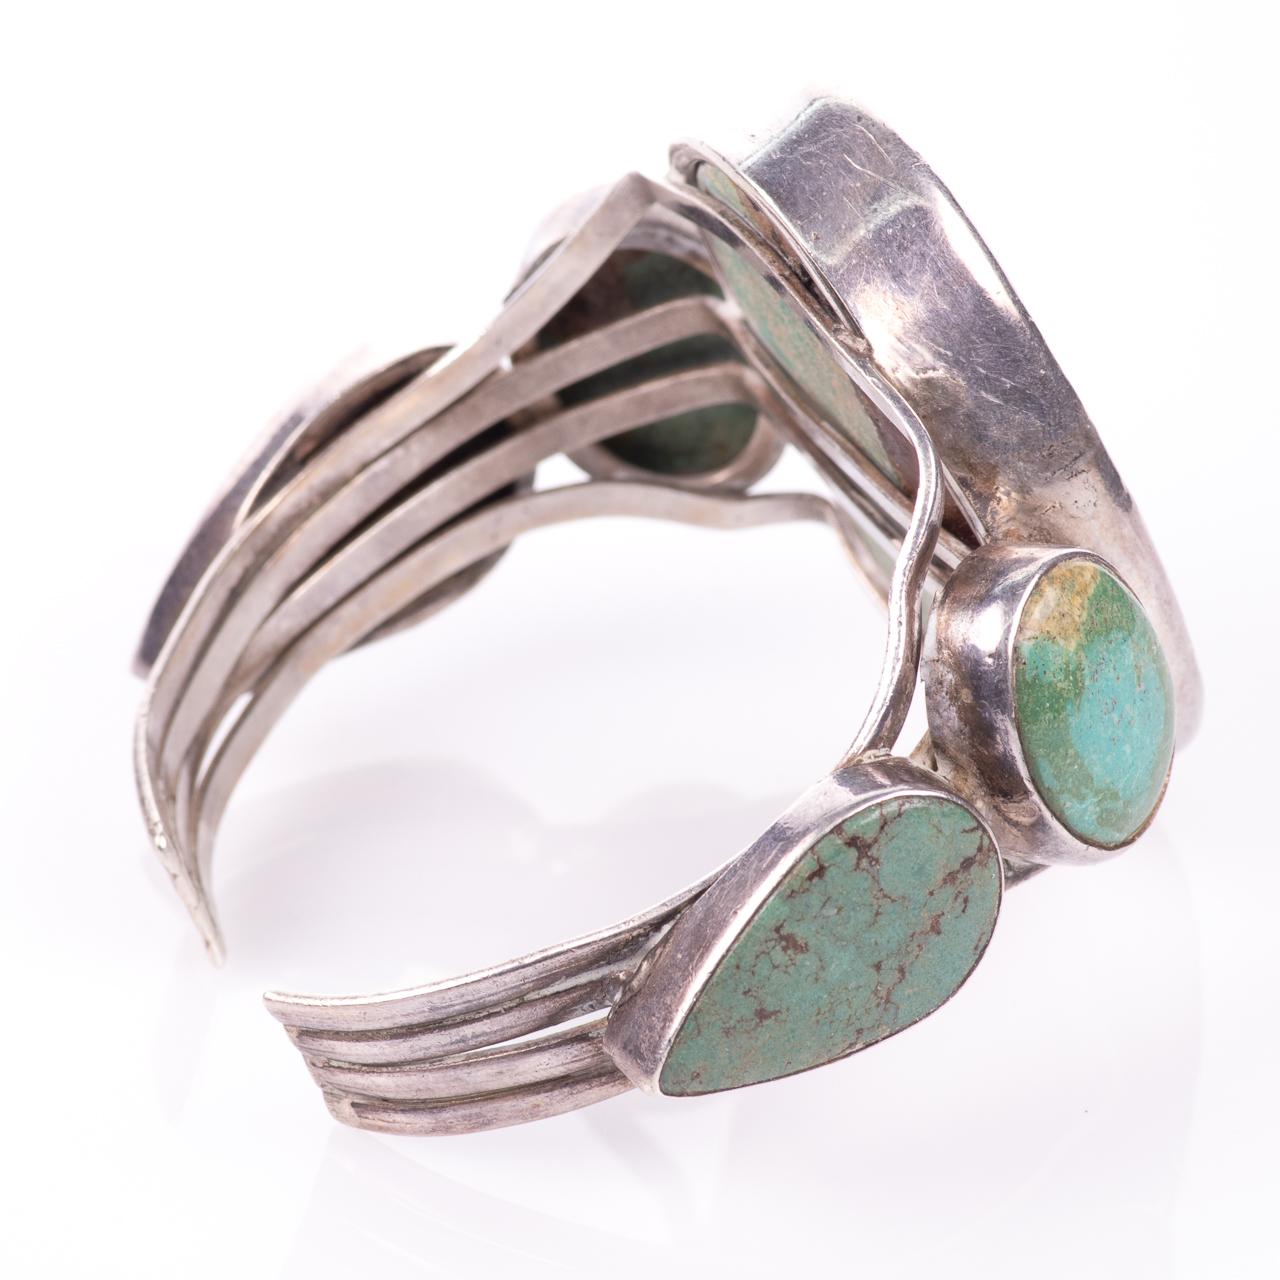 White Metal Navajo Turquoise Bangle - Image 5 of 6